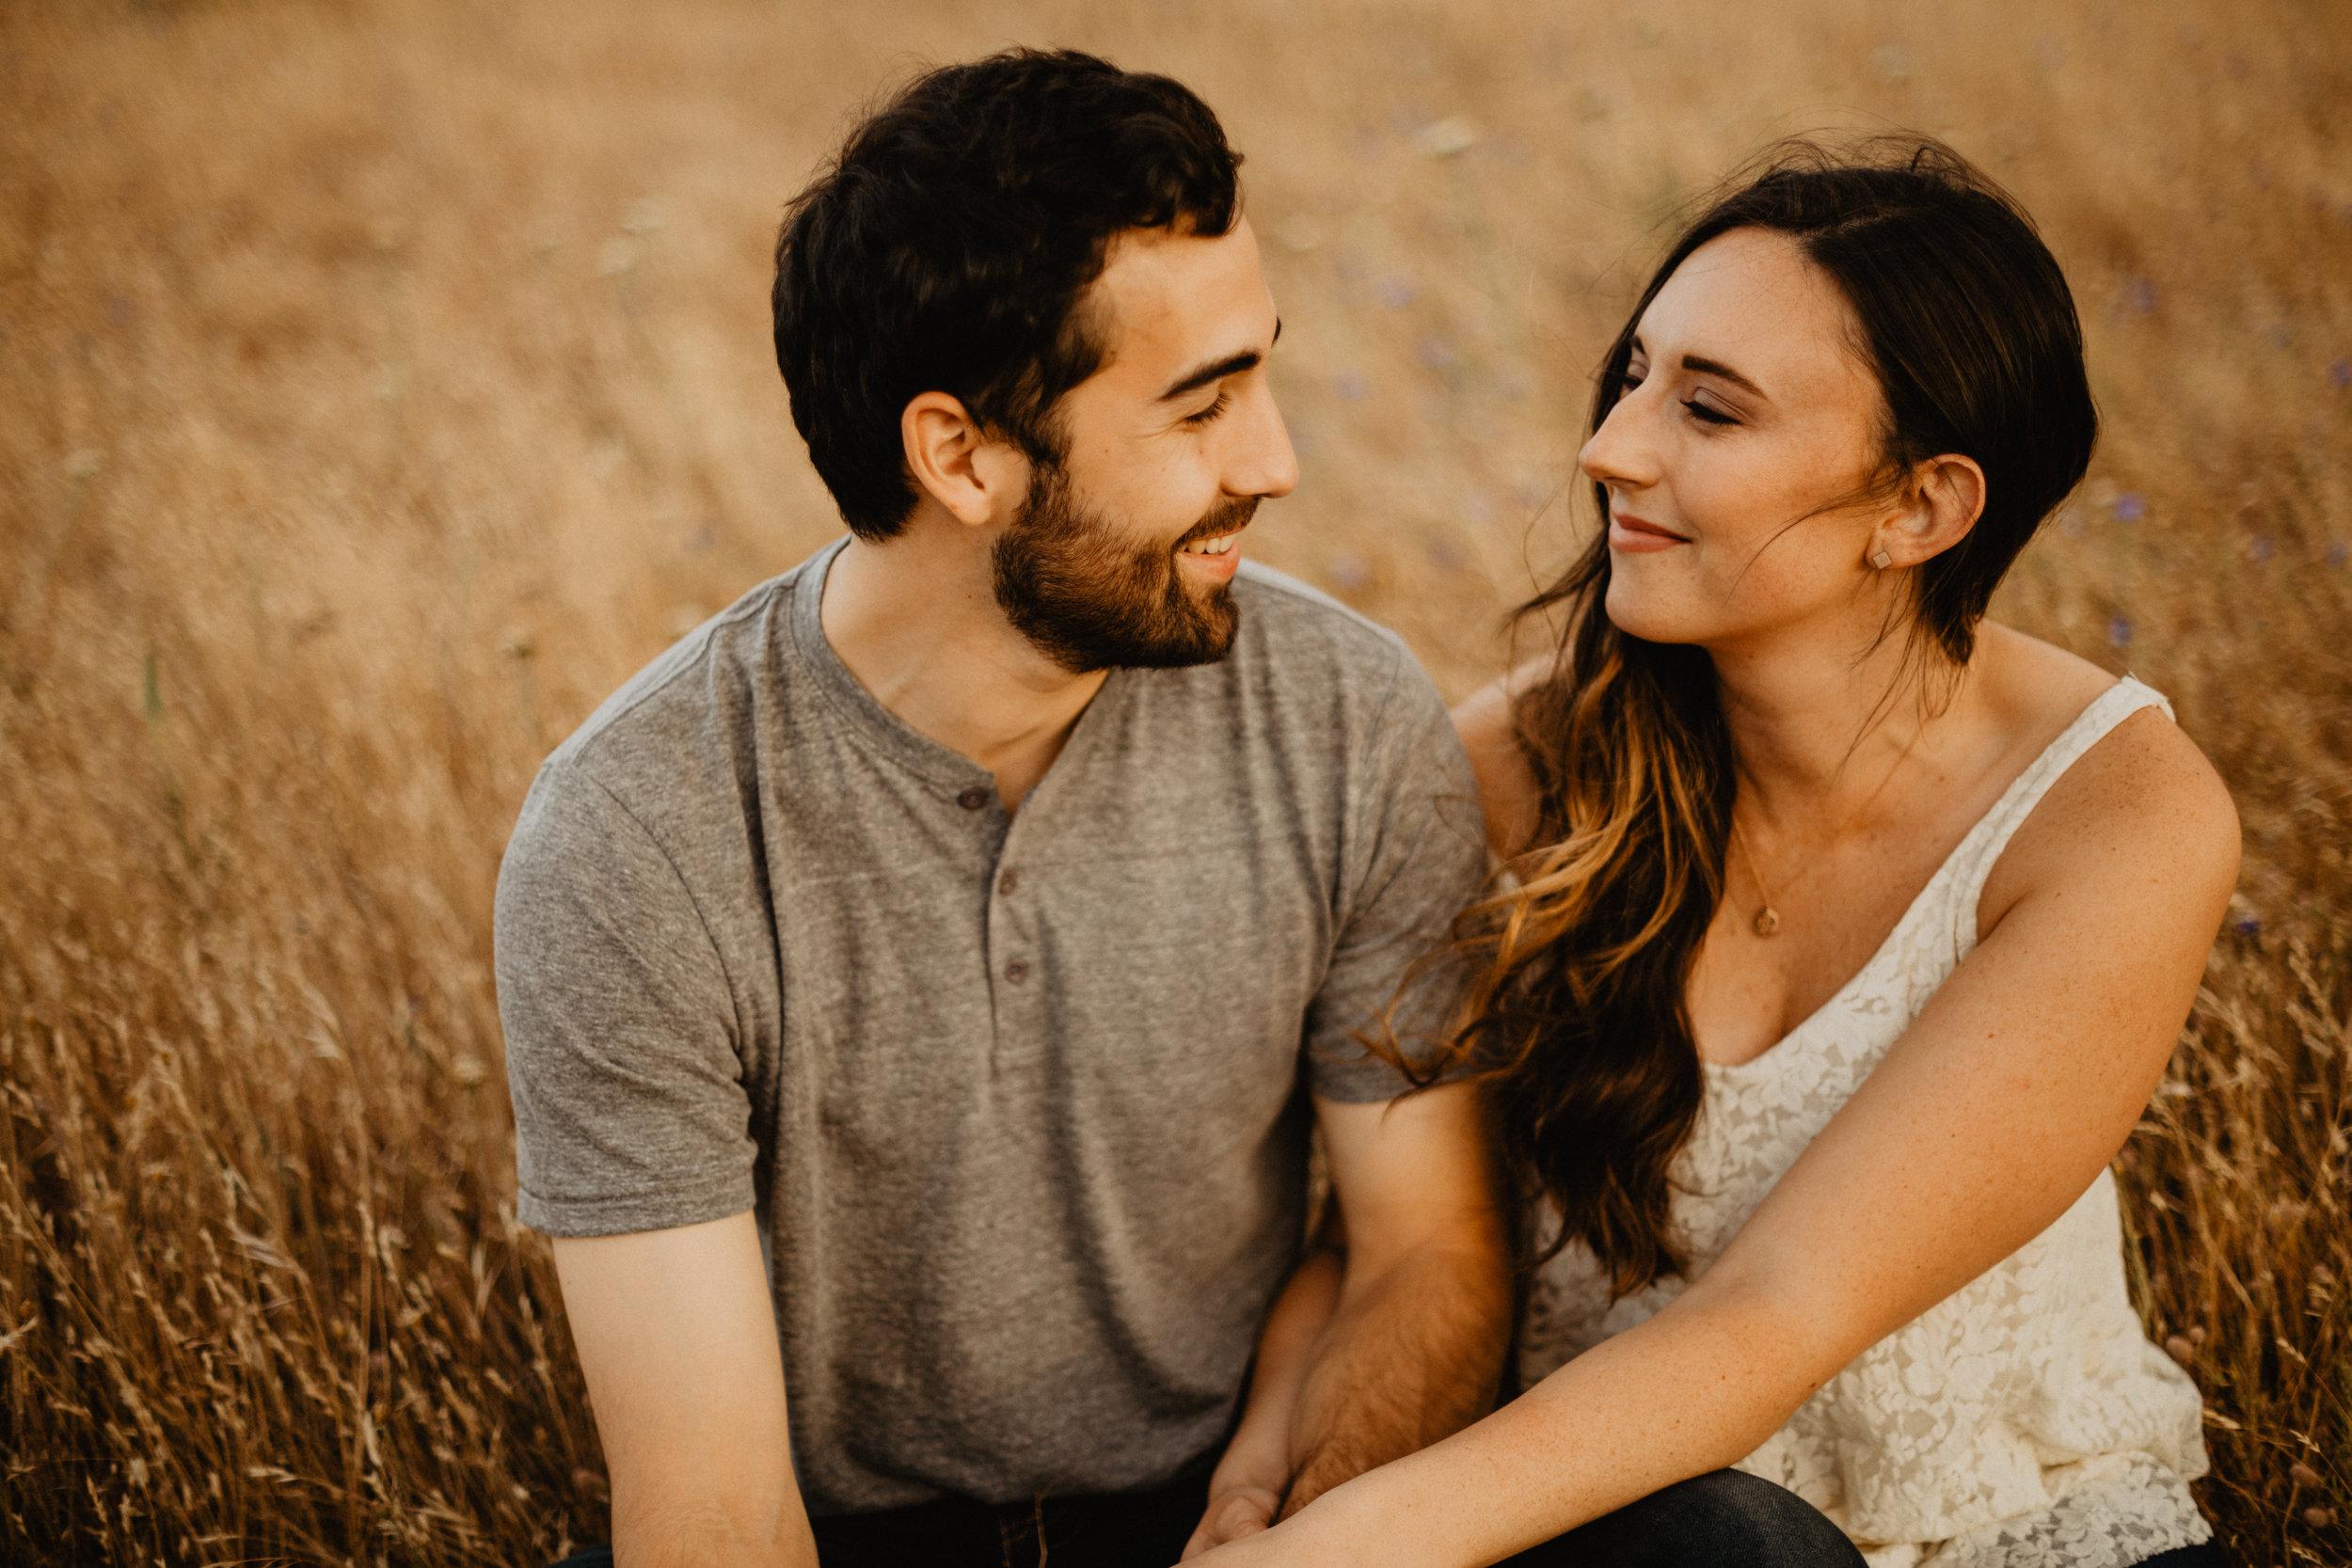 rowena crest engagement, oregon wedding photographer, engagement photos, natural light photographer-95.jpg